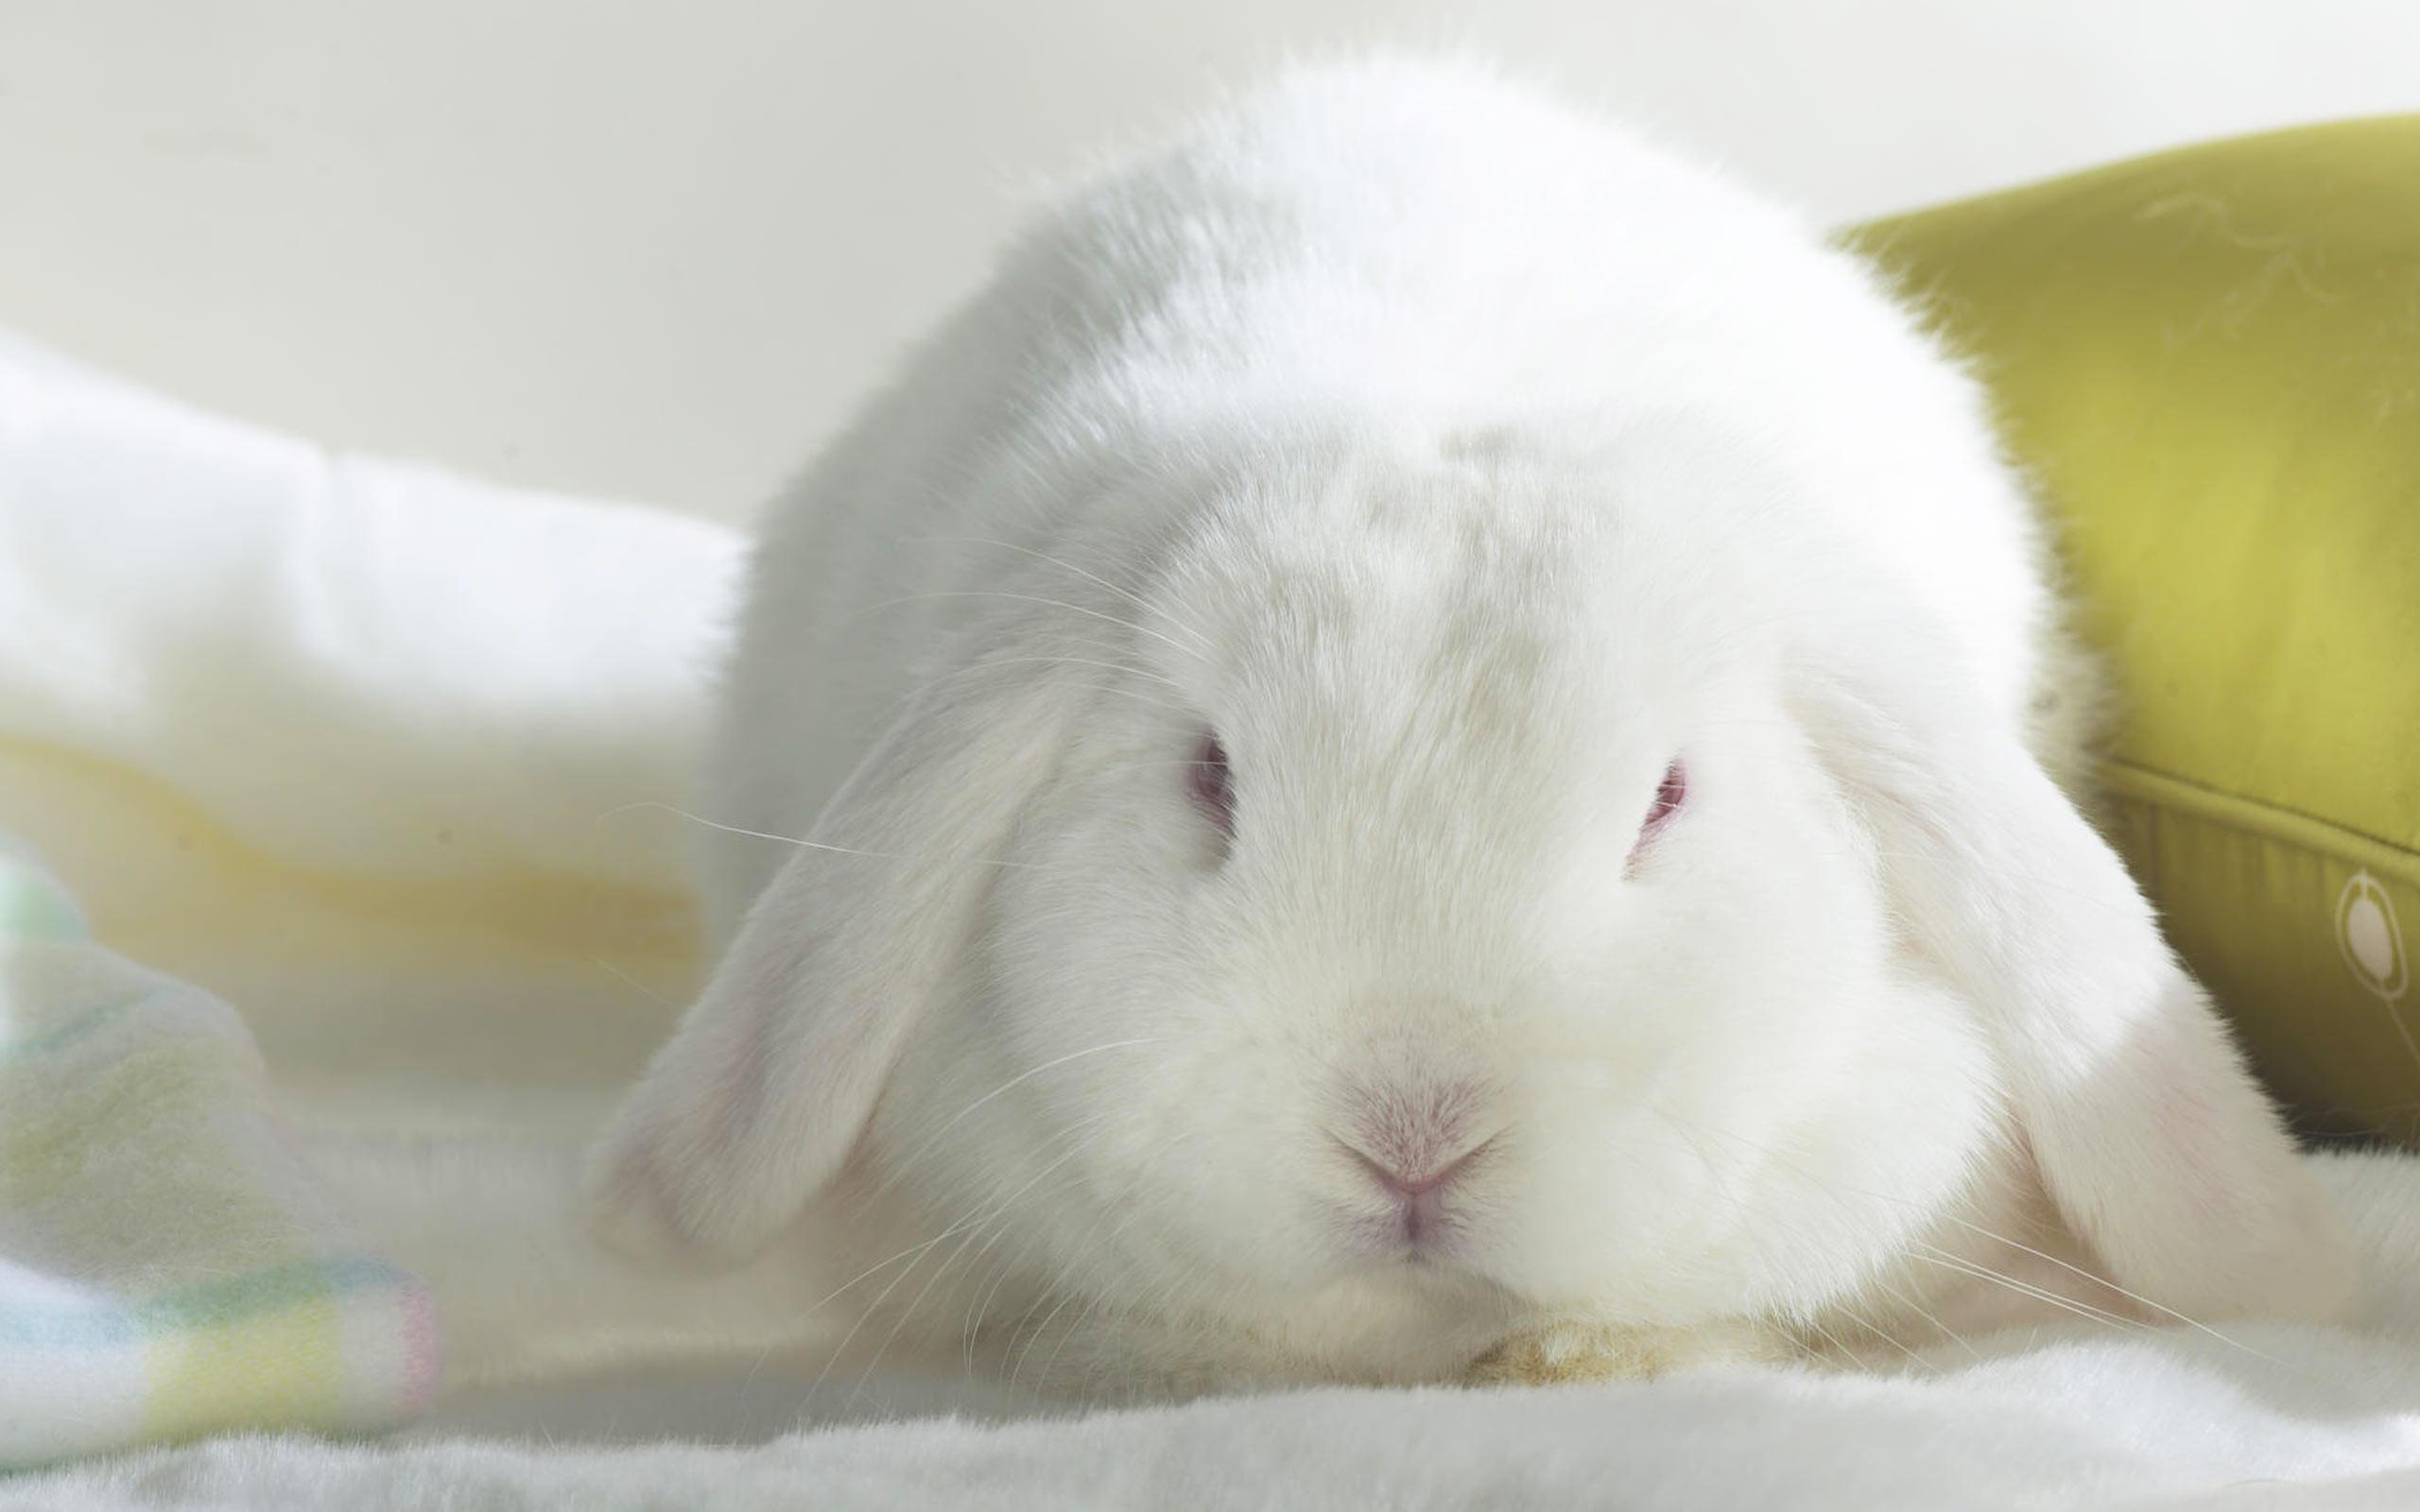 White Bunny Desktop hd Wallpaper   High Quality Wallpapers,Wallpaper .